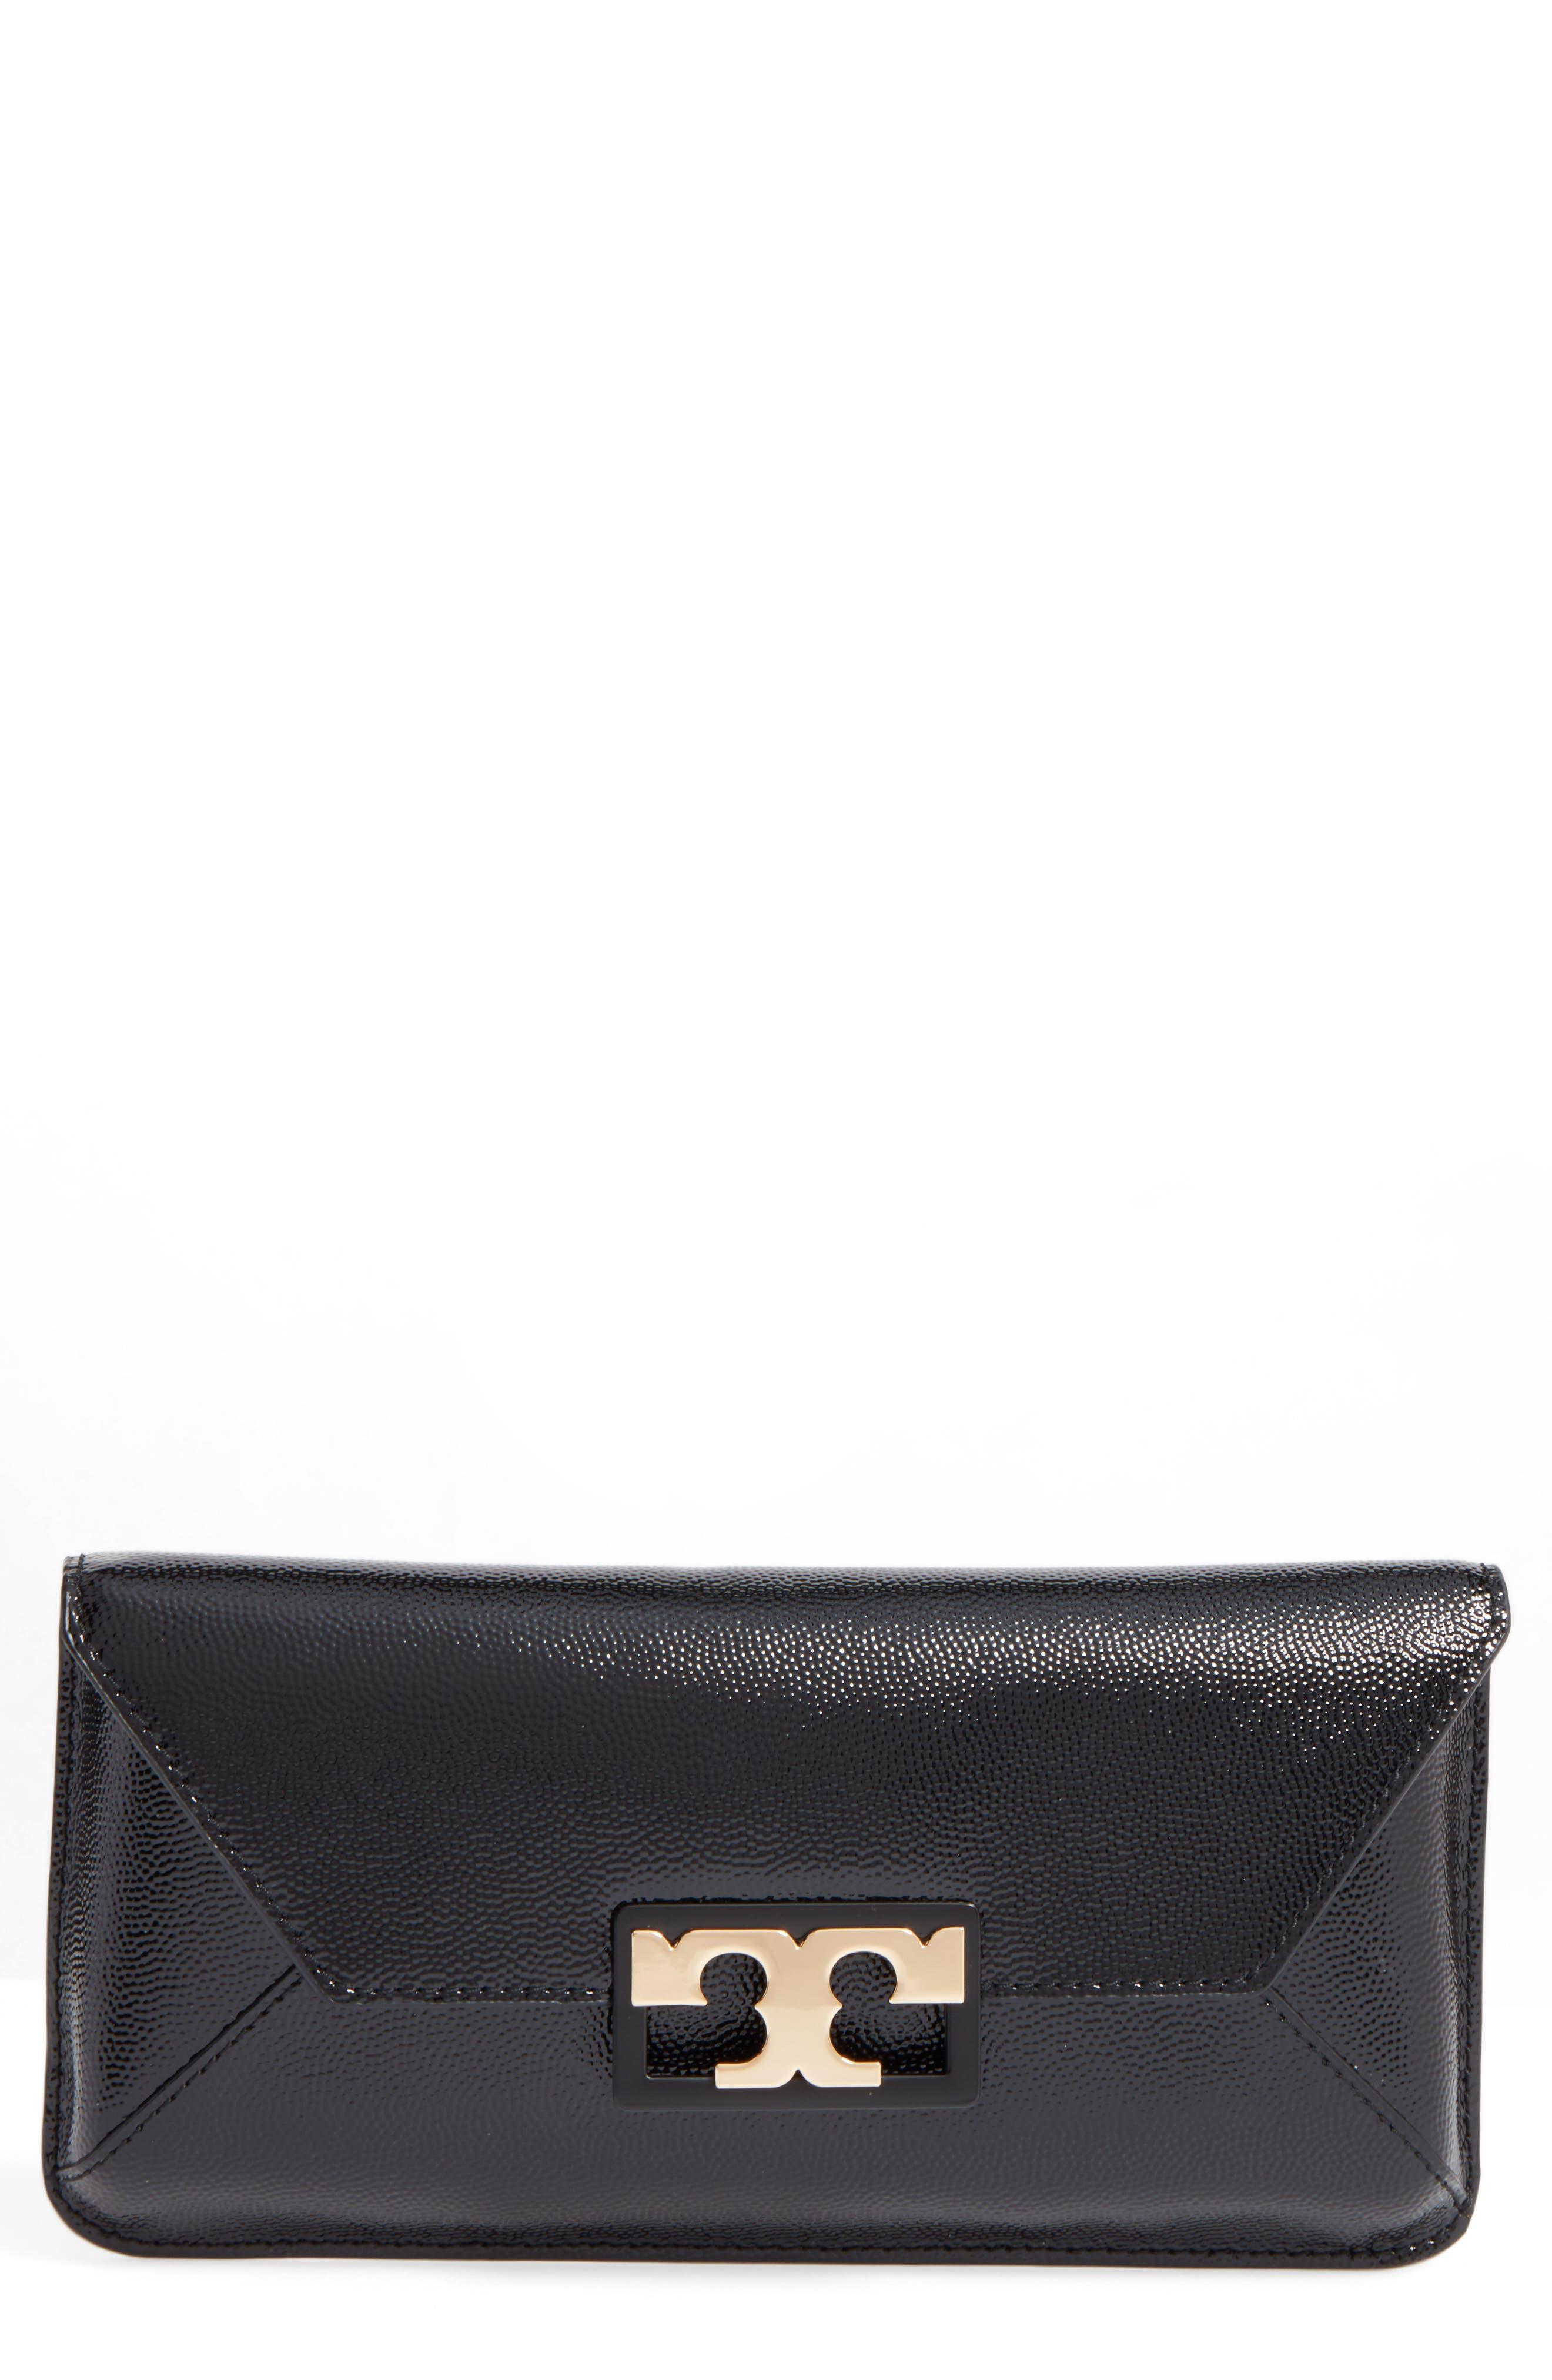 TORY BURCH, Gigi Caviar Leather Clutch, Main thumbnail 1, color, 001